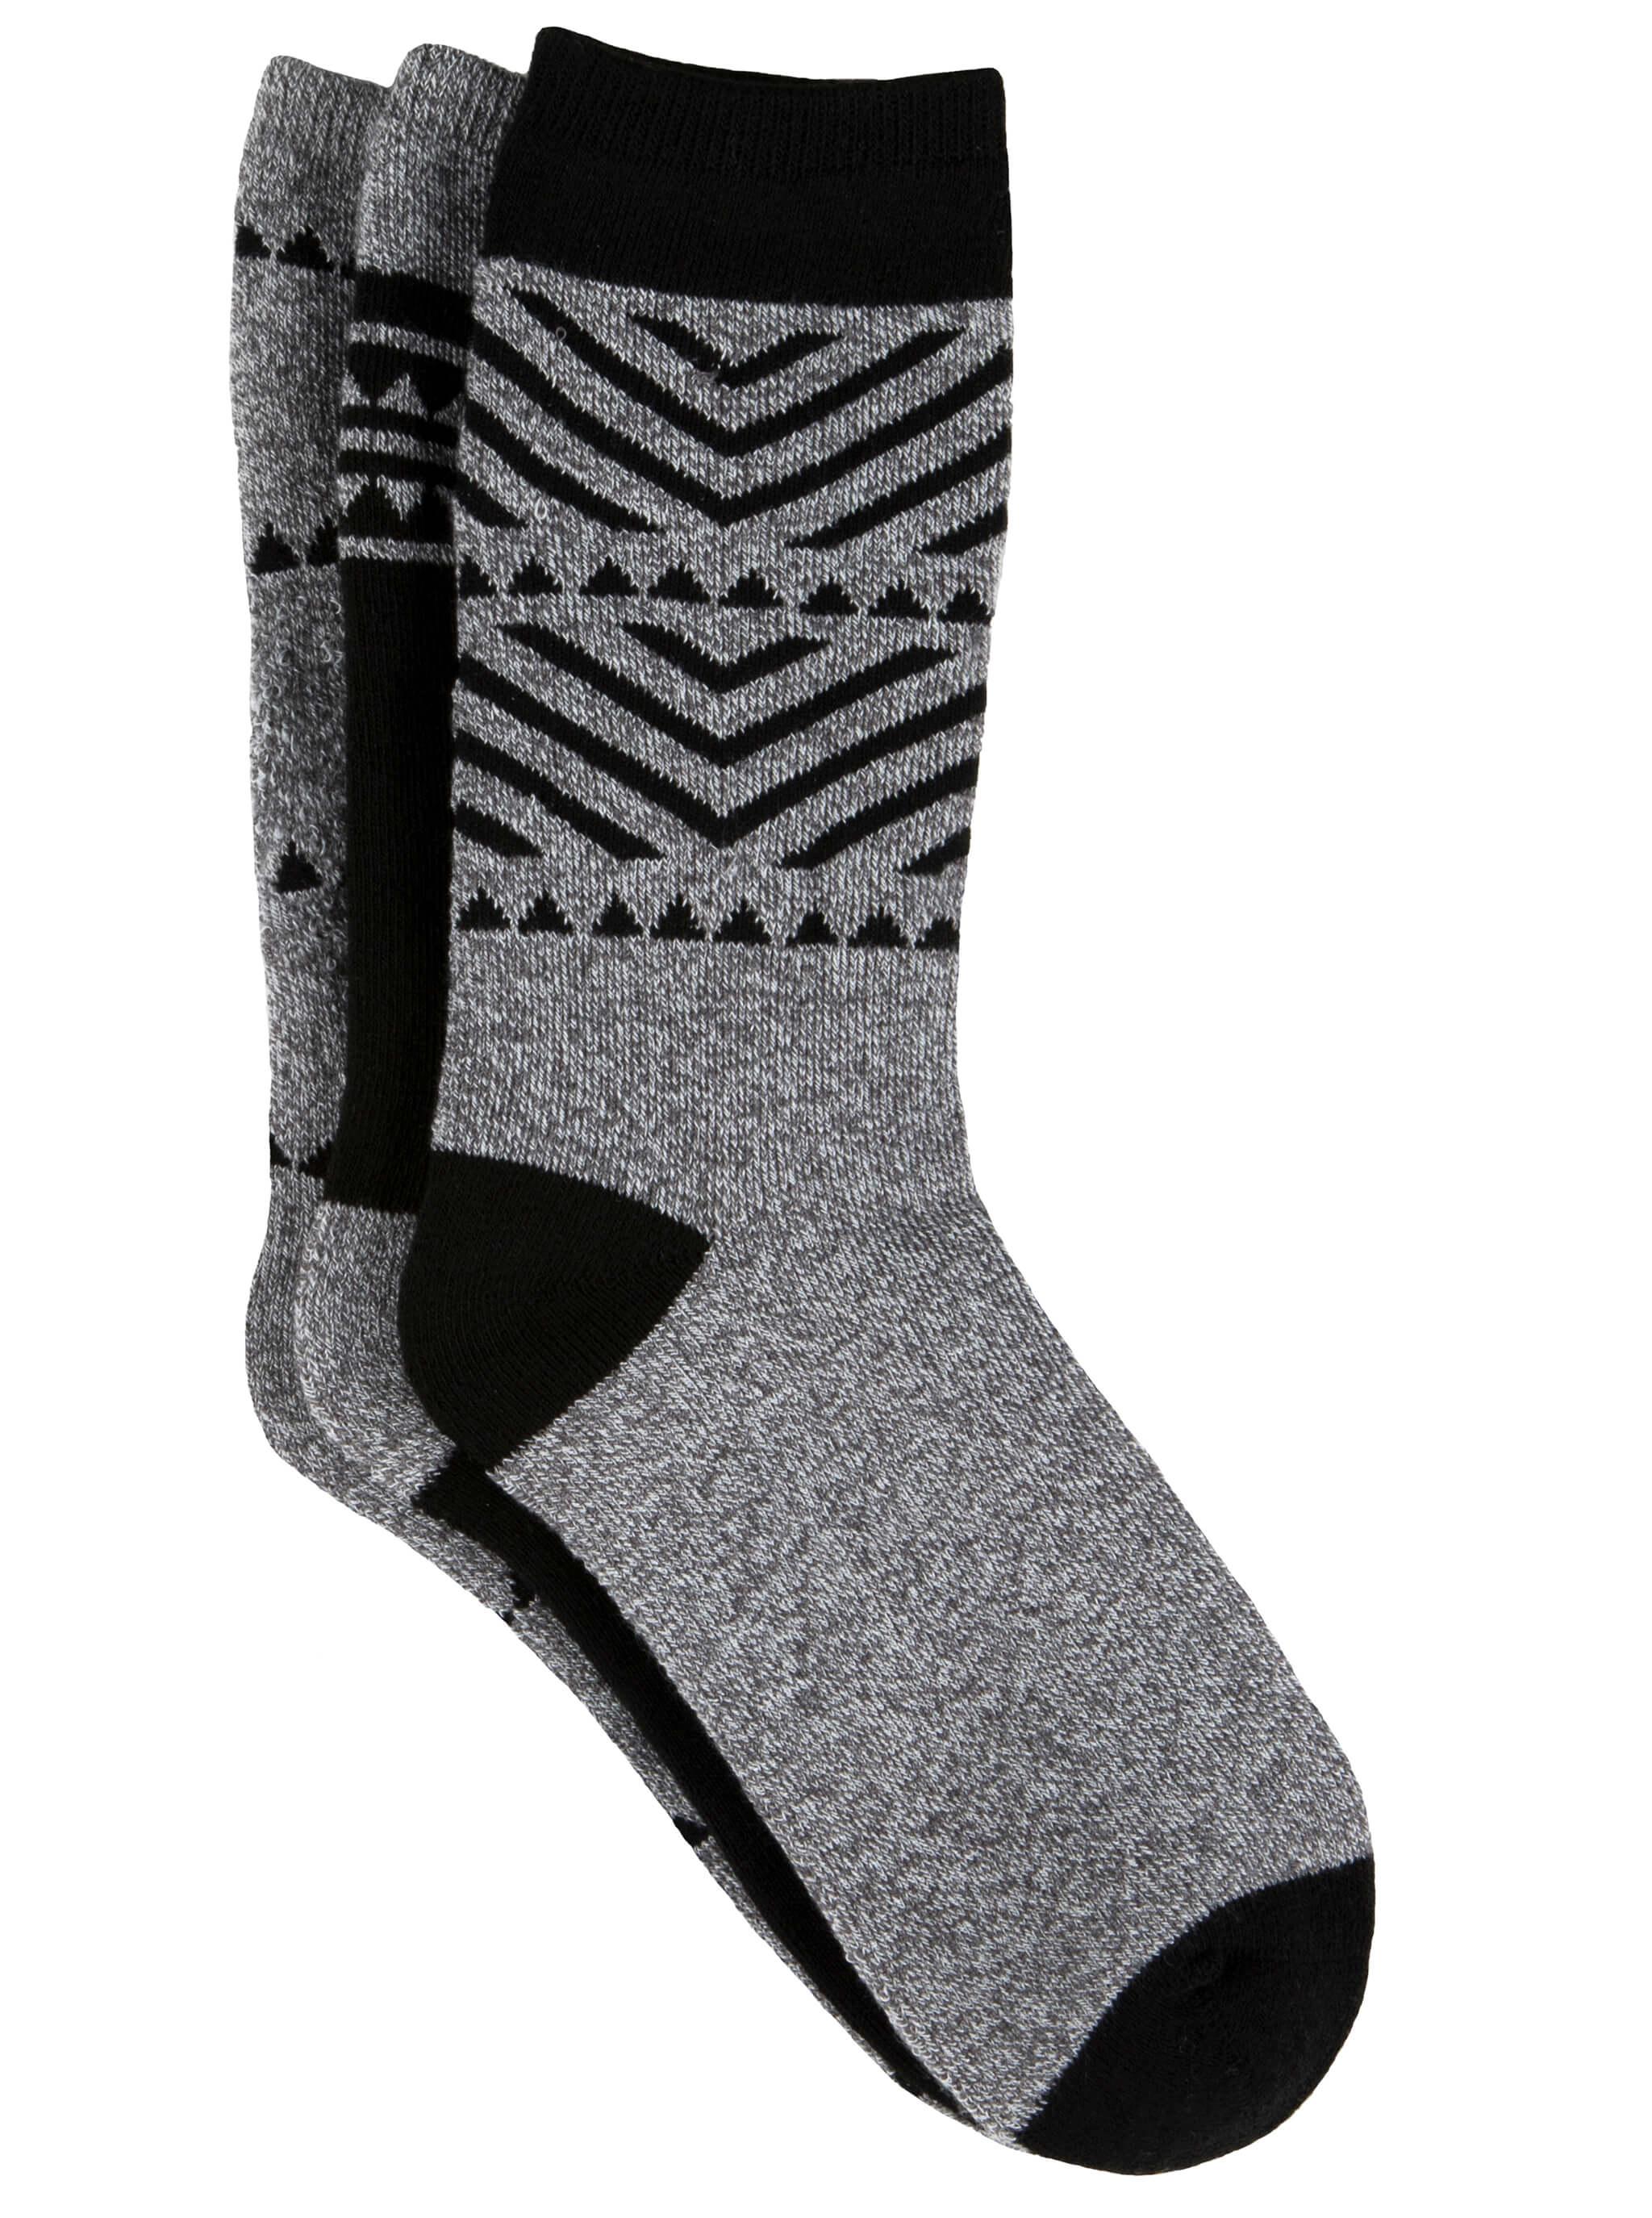 Free Country Women's Geo Basic Full Cushion Crew Socks - Grey